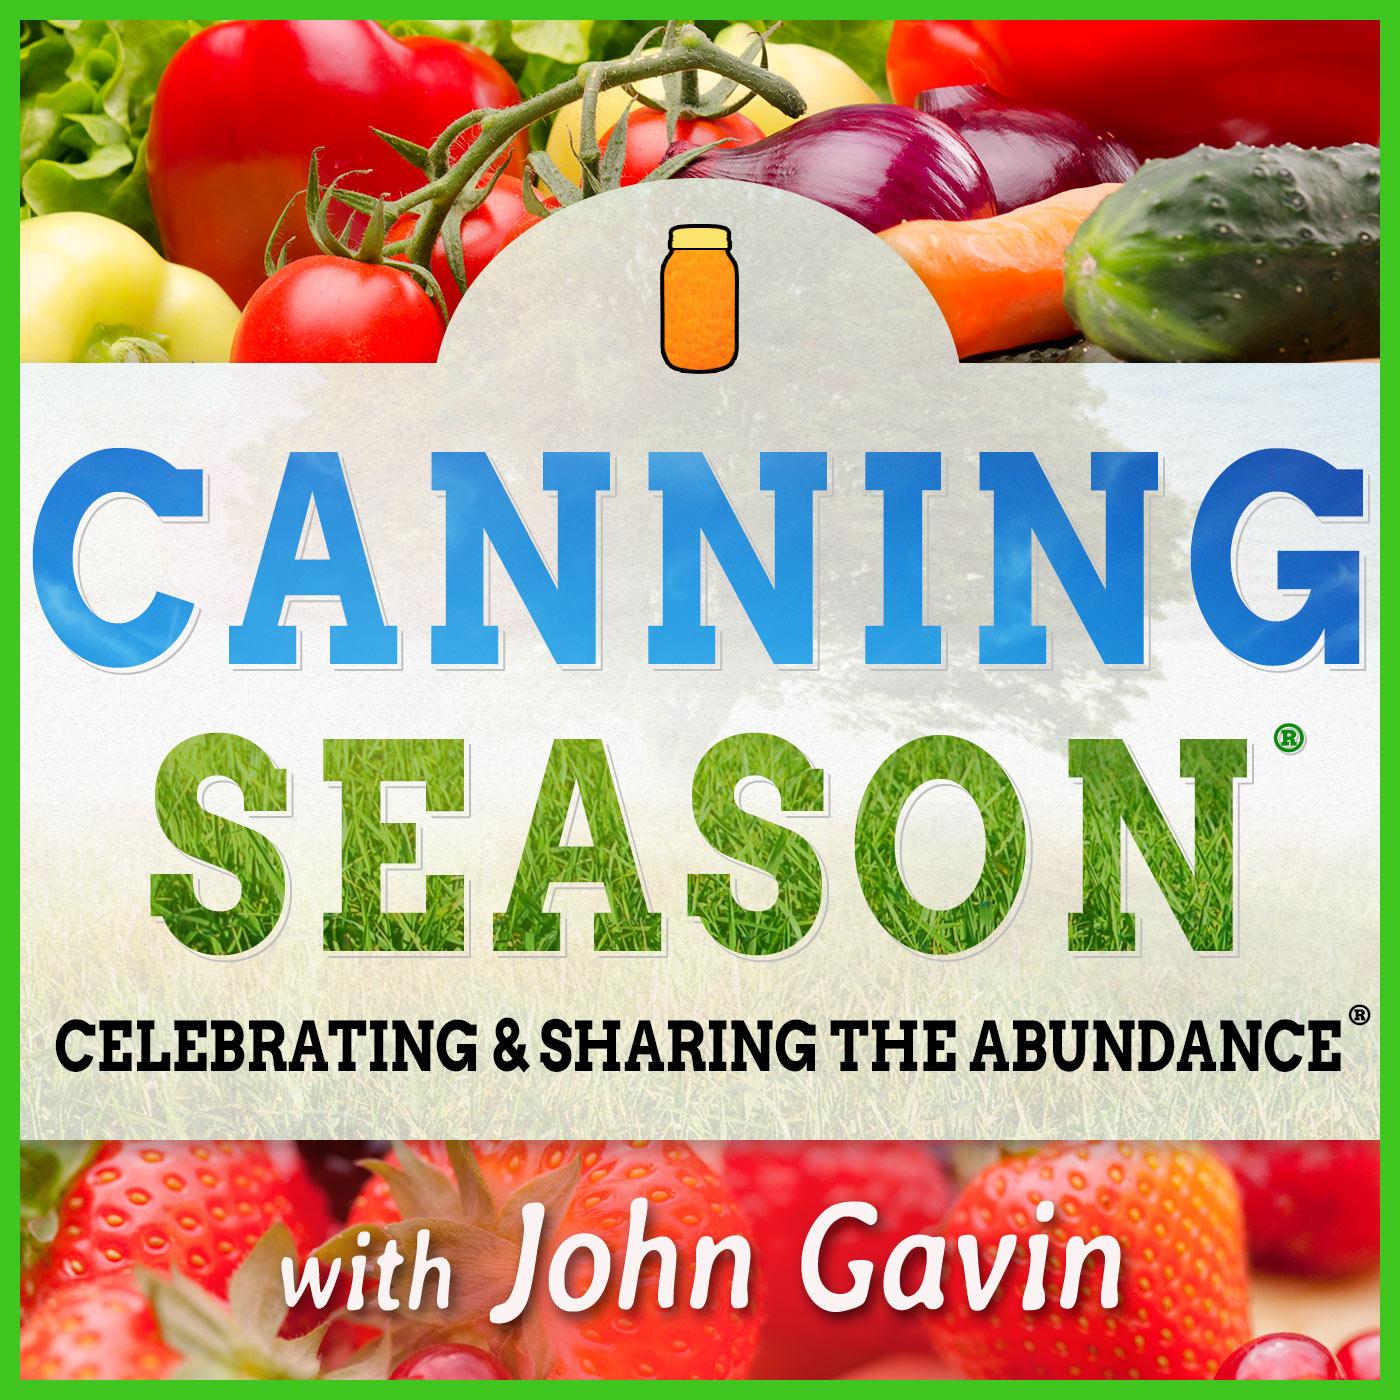 Canning Season®